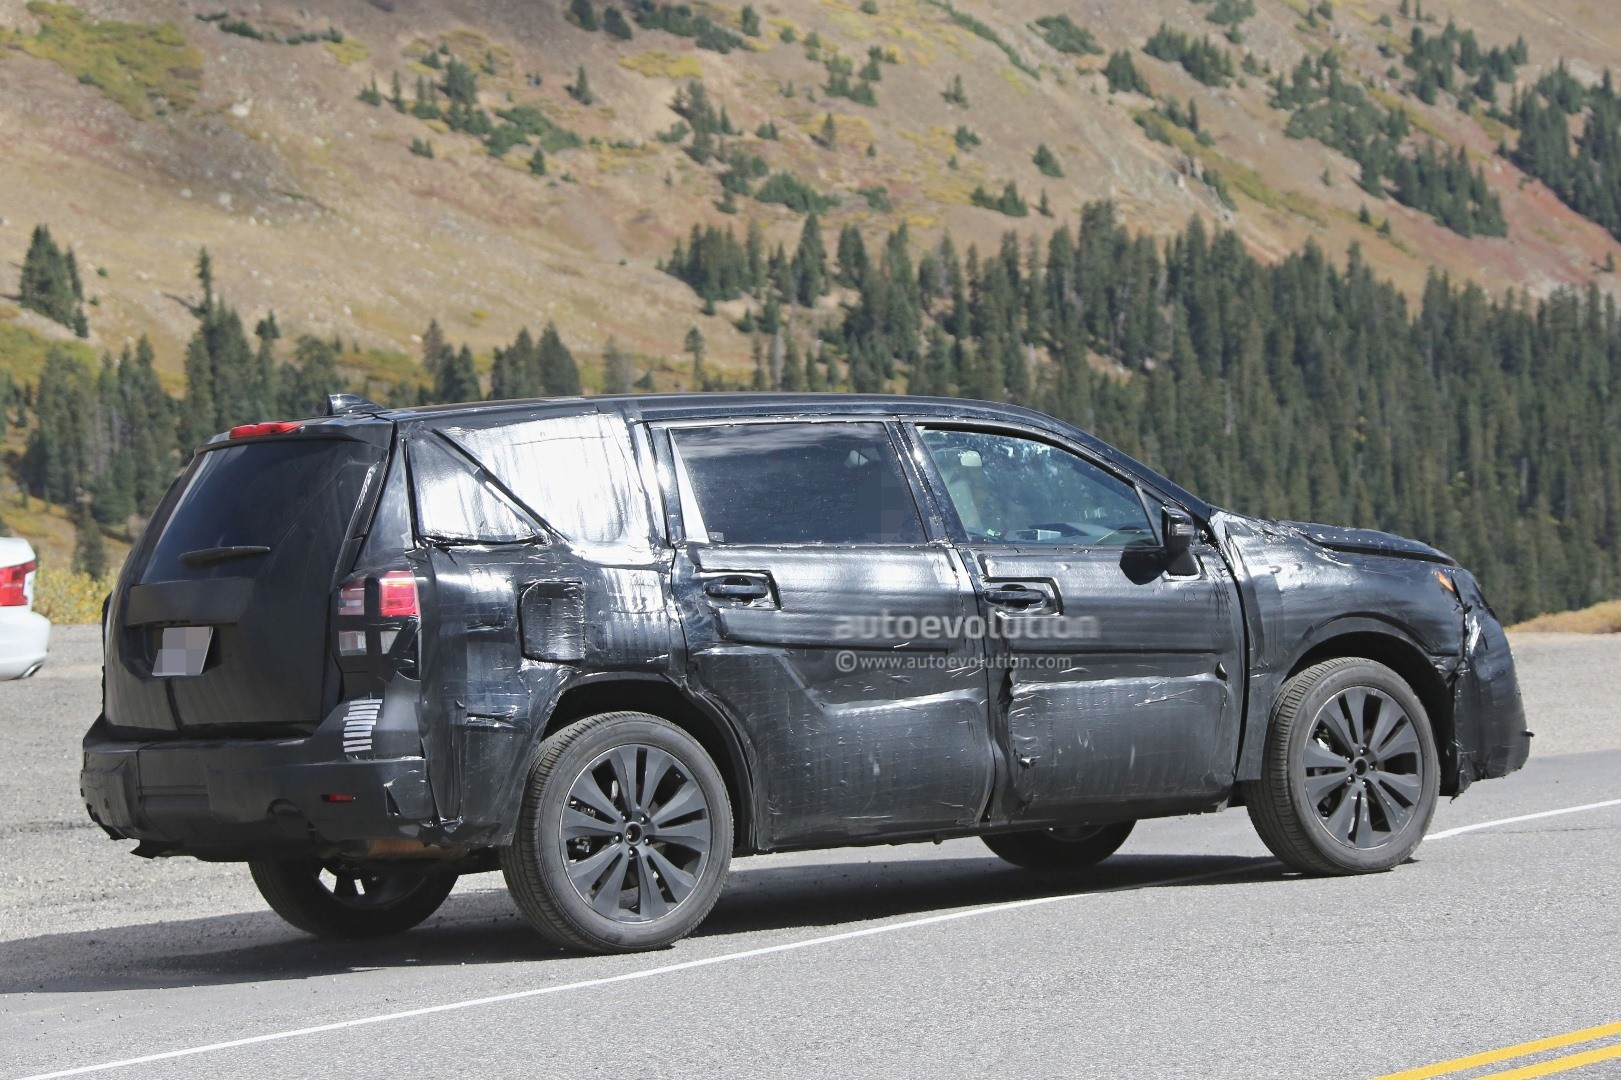 Tribeca Subaru 2016 >> 2019 Subaru Tribeca Mid-Size 7-Seat SUV Previewed by Viziv-7 Concept - autoevolution